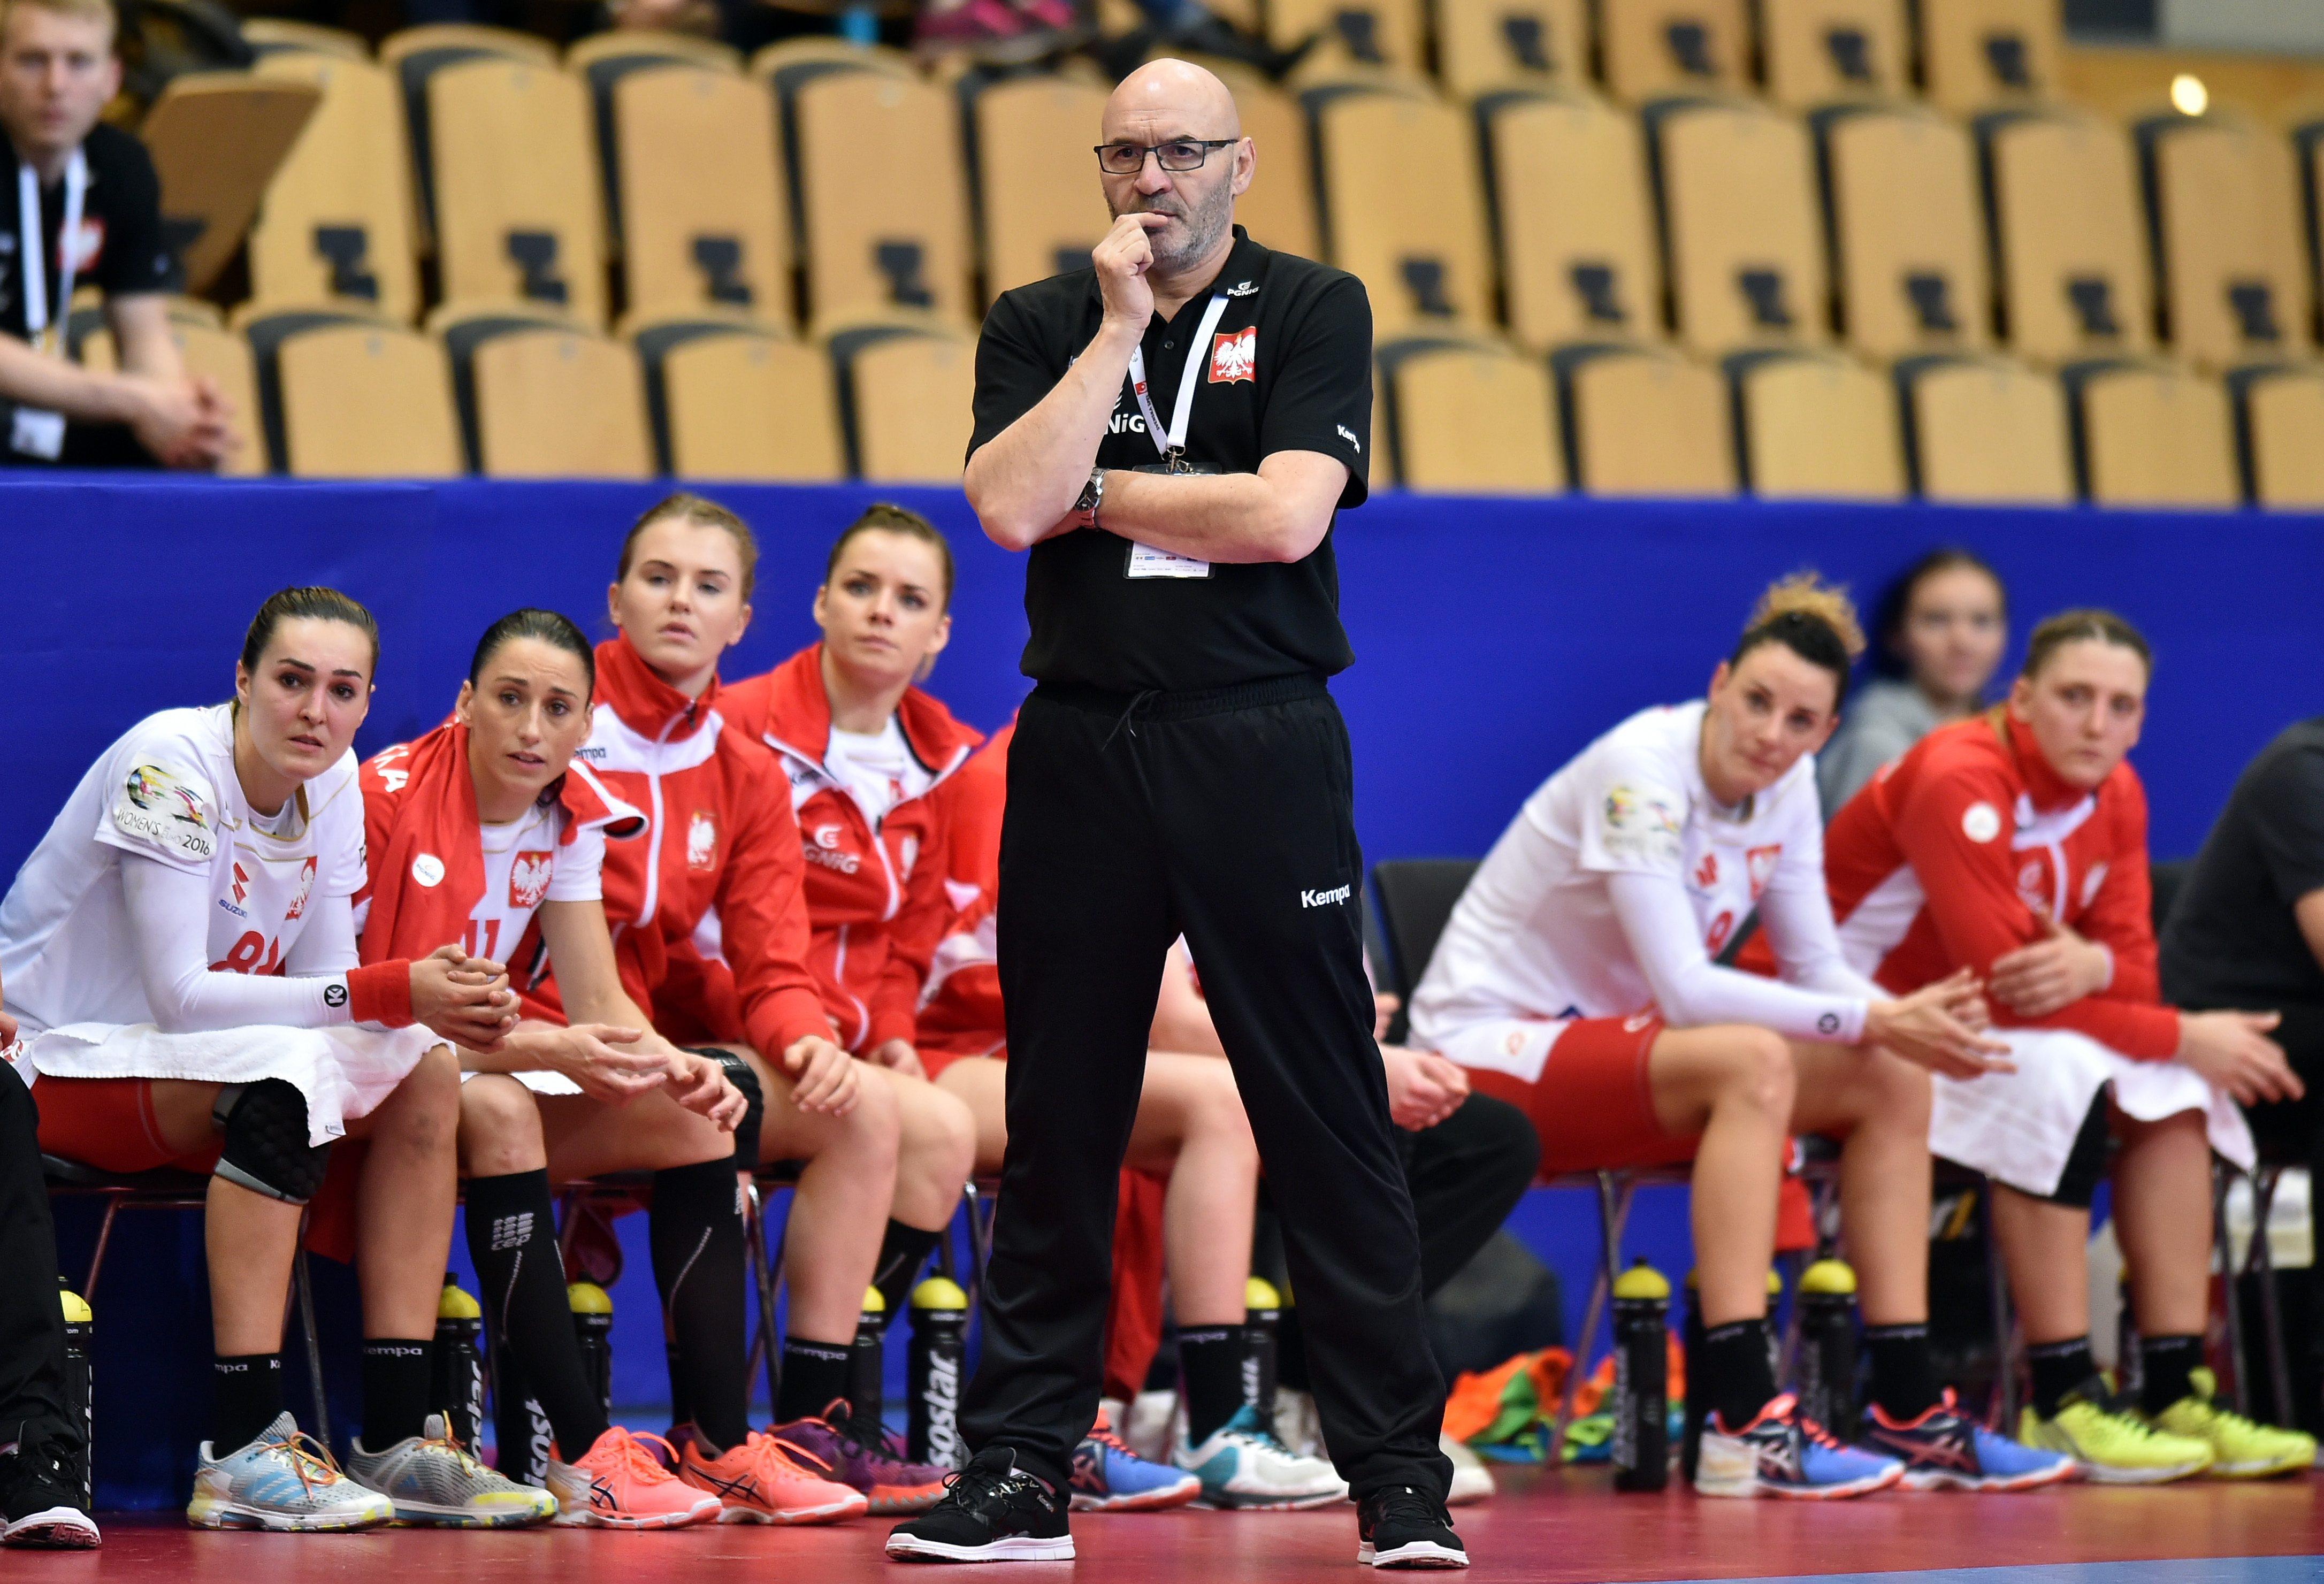 Foto: Łukasz Laskowski / PressFocus